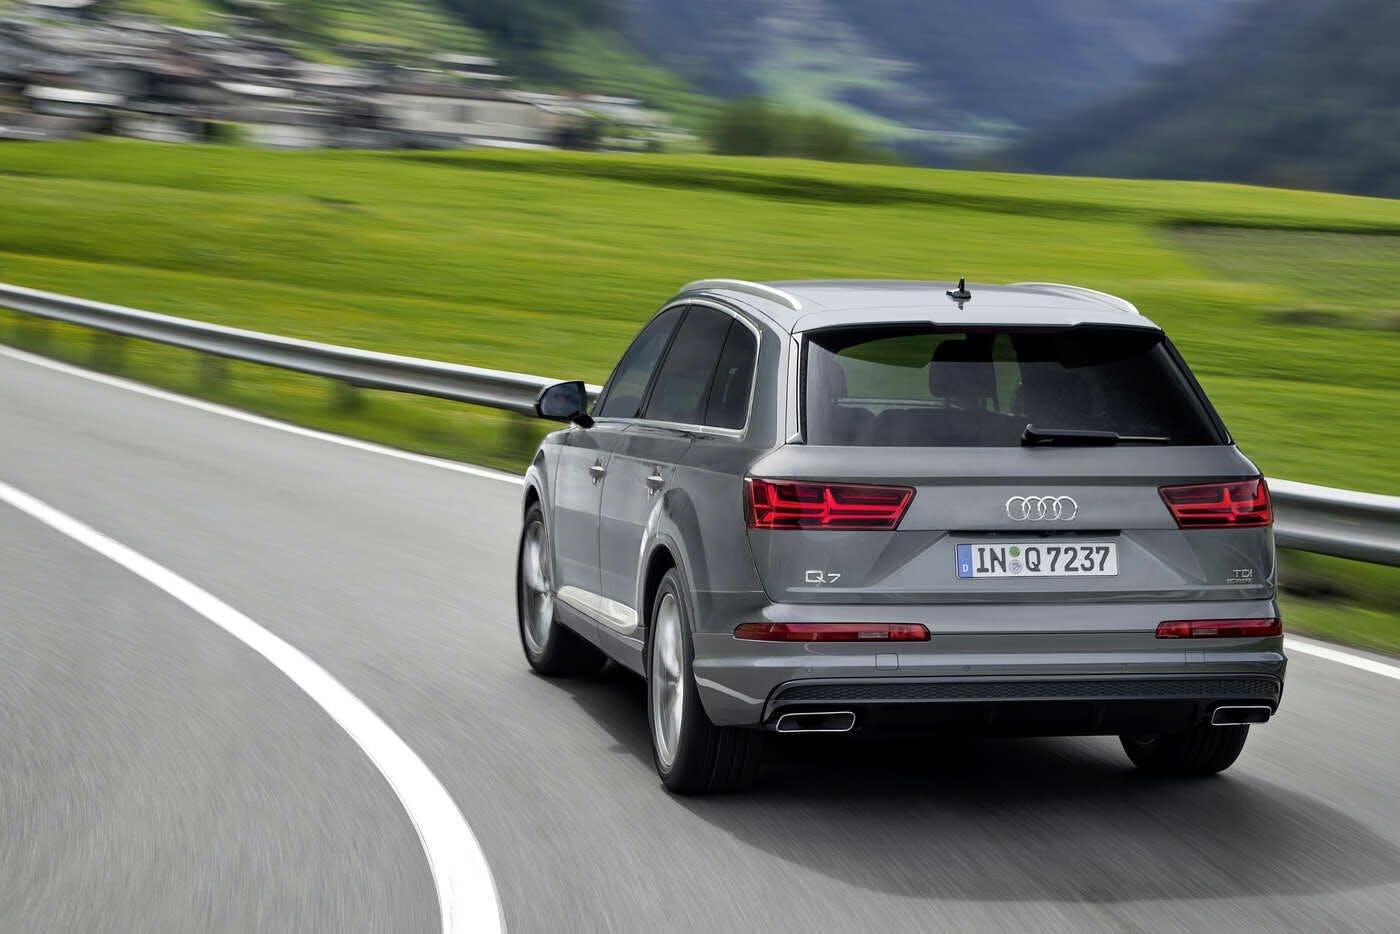 2019 Audi Q7 Comparisons, Reviews & Pictures | TrueCar